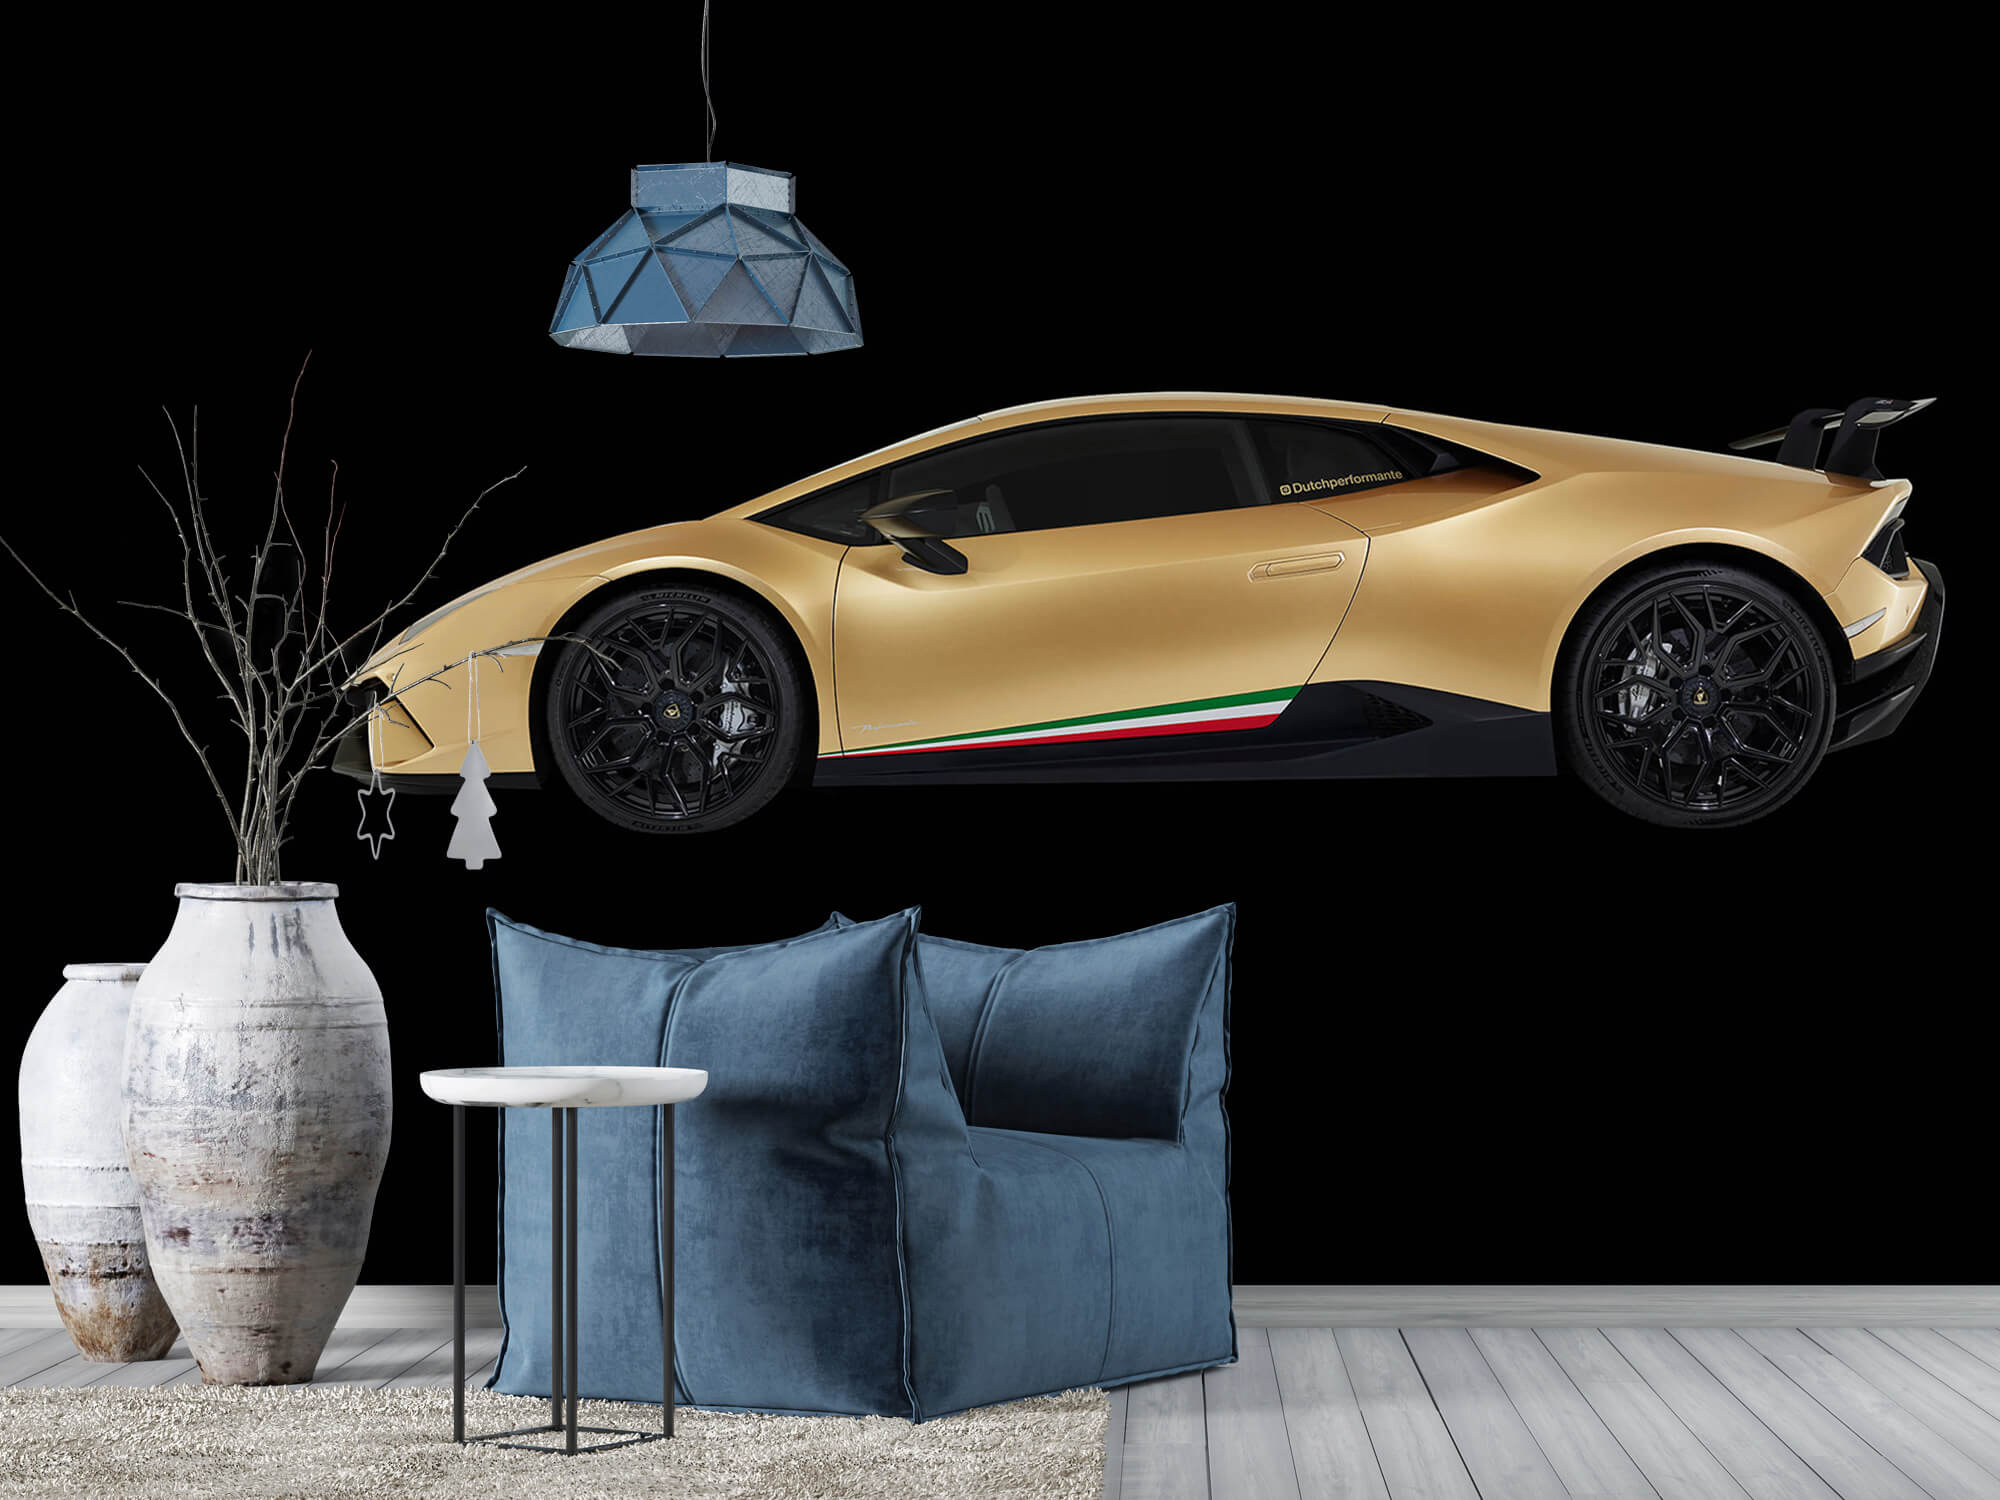 Wallpaper Lamborghini Huracán - Zijkant, zwart 9